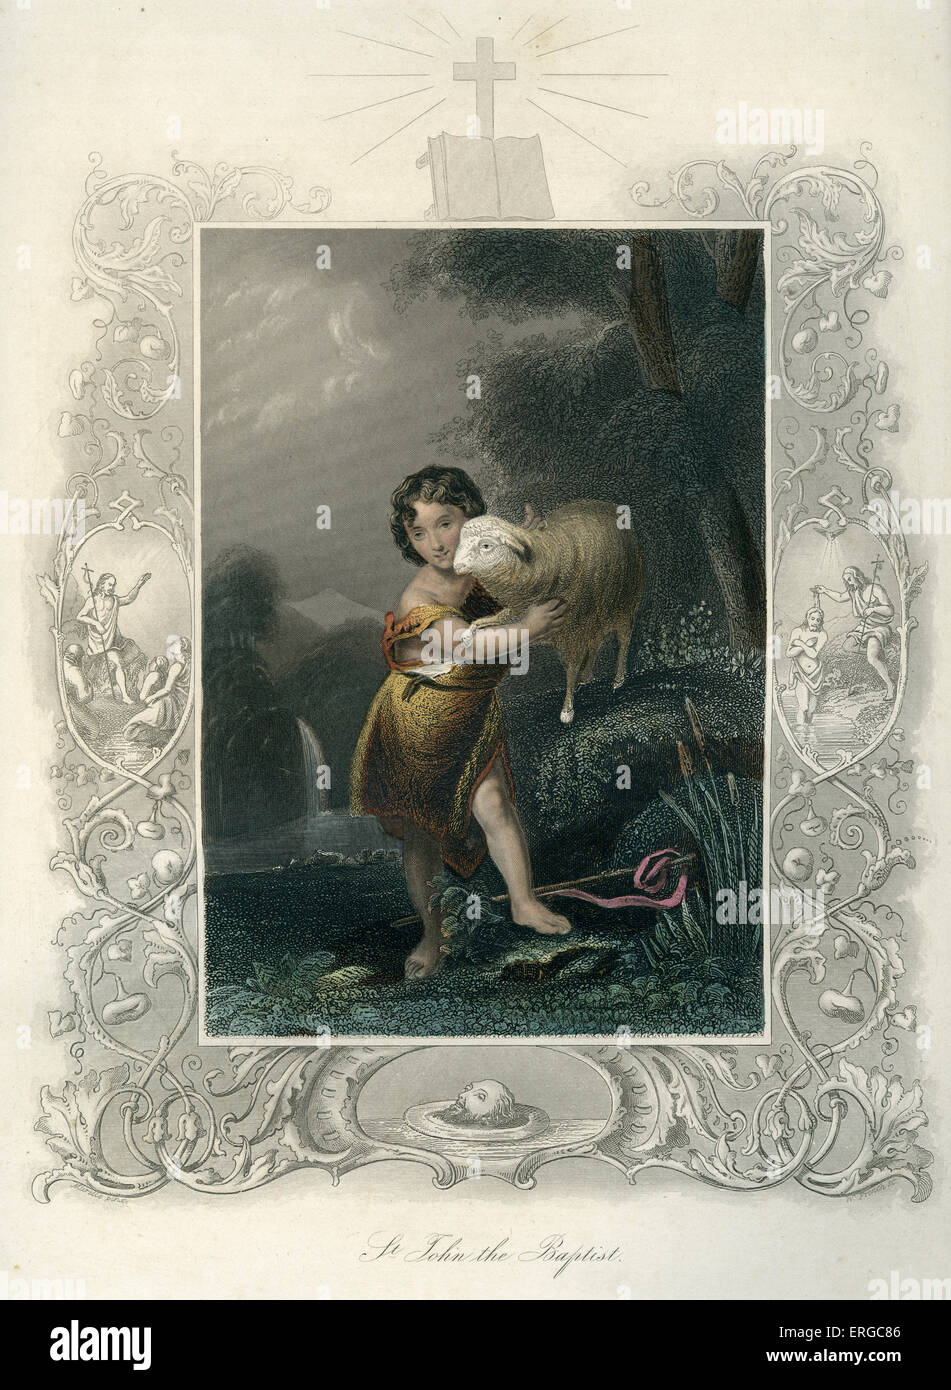 Saint John the Baptist with a lamb. - Stock Image